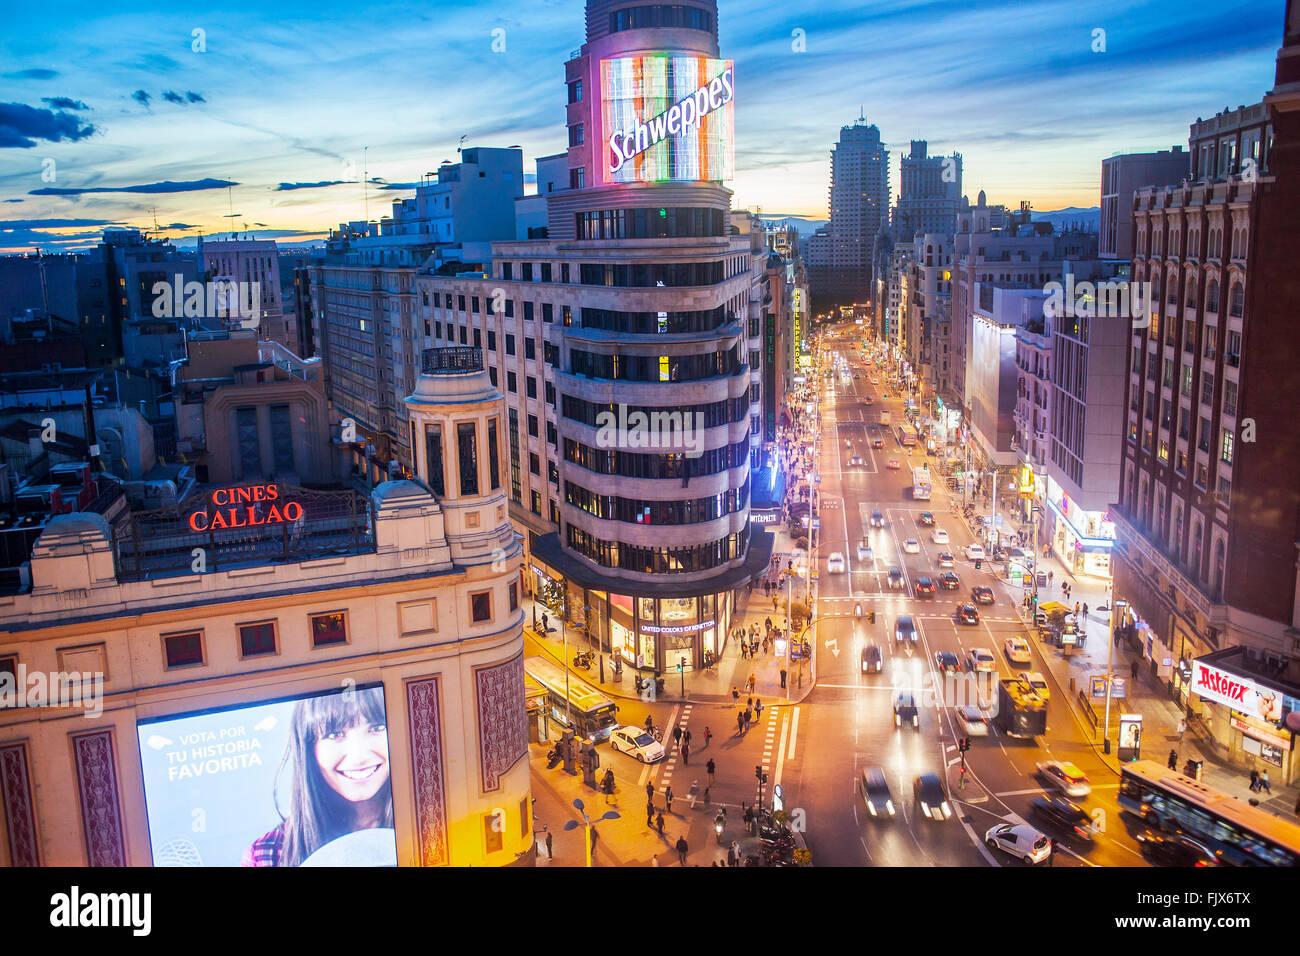 Callao Square und Gran Via Avenue, in der mittleren Capitol Building.  Madrid. Spanien. Stockbild